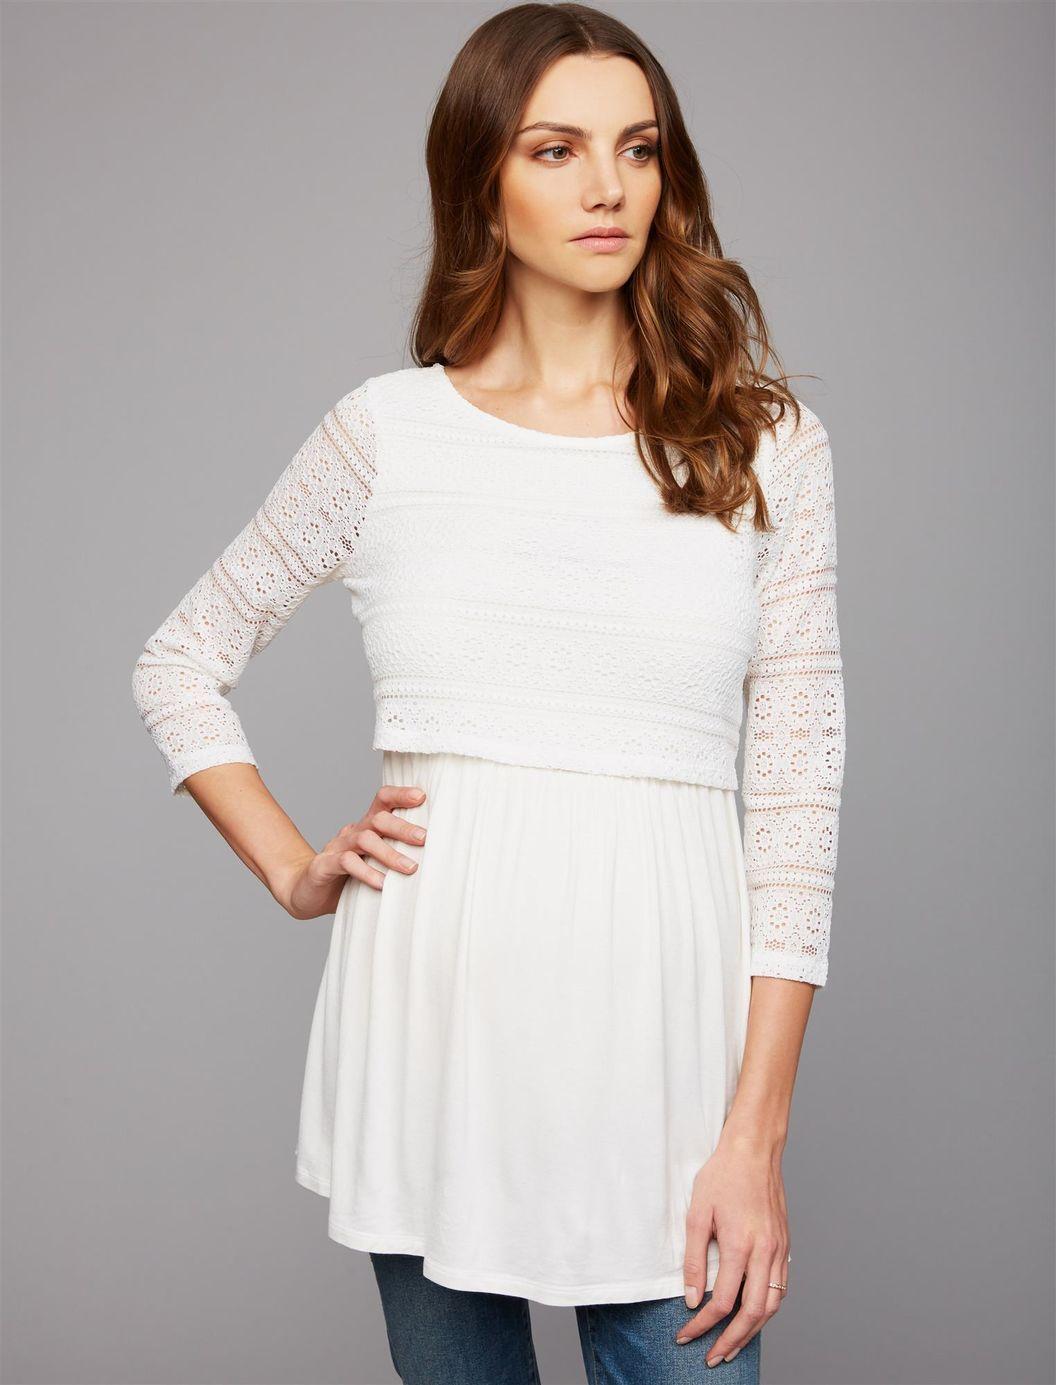 323ac49a28023 Maternity Tops, Maternity Wear, Maternity Fashion, Maternity Style, Novelty  Fabric, Baby